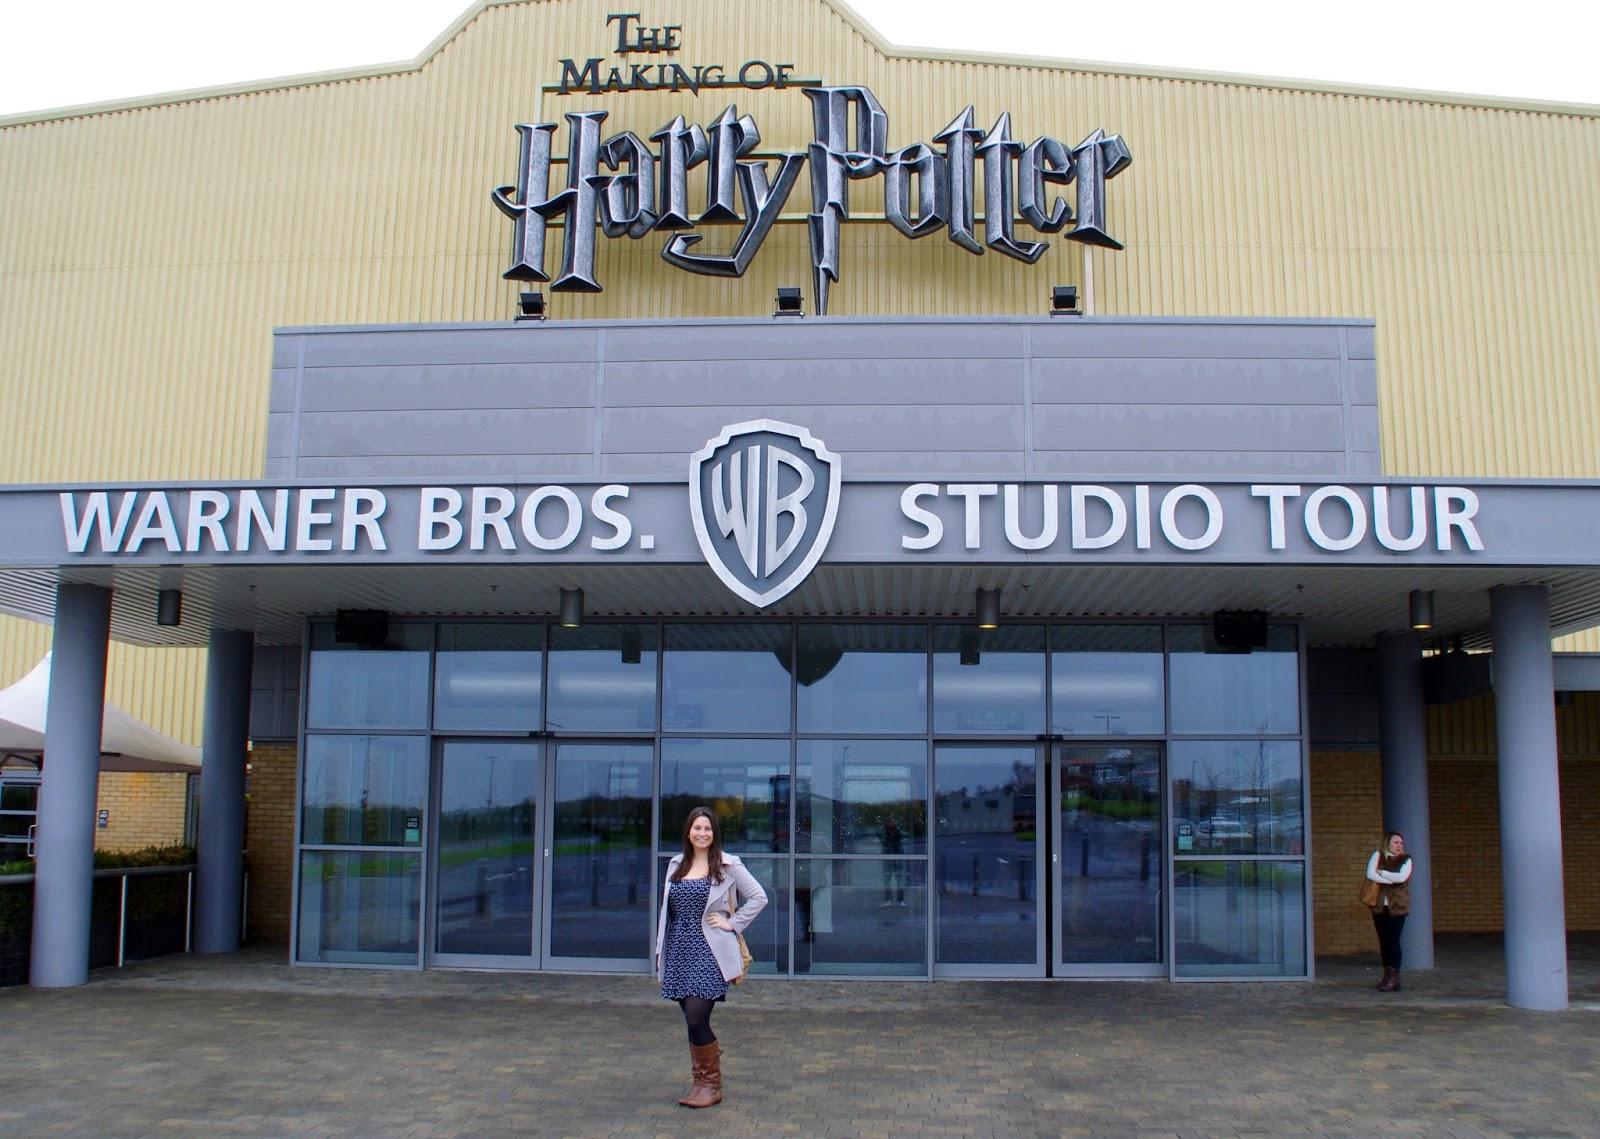 Warner Brothers Harry Potter Studio Tour